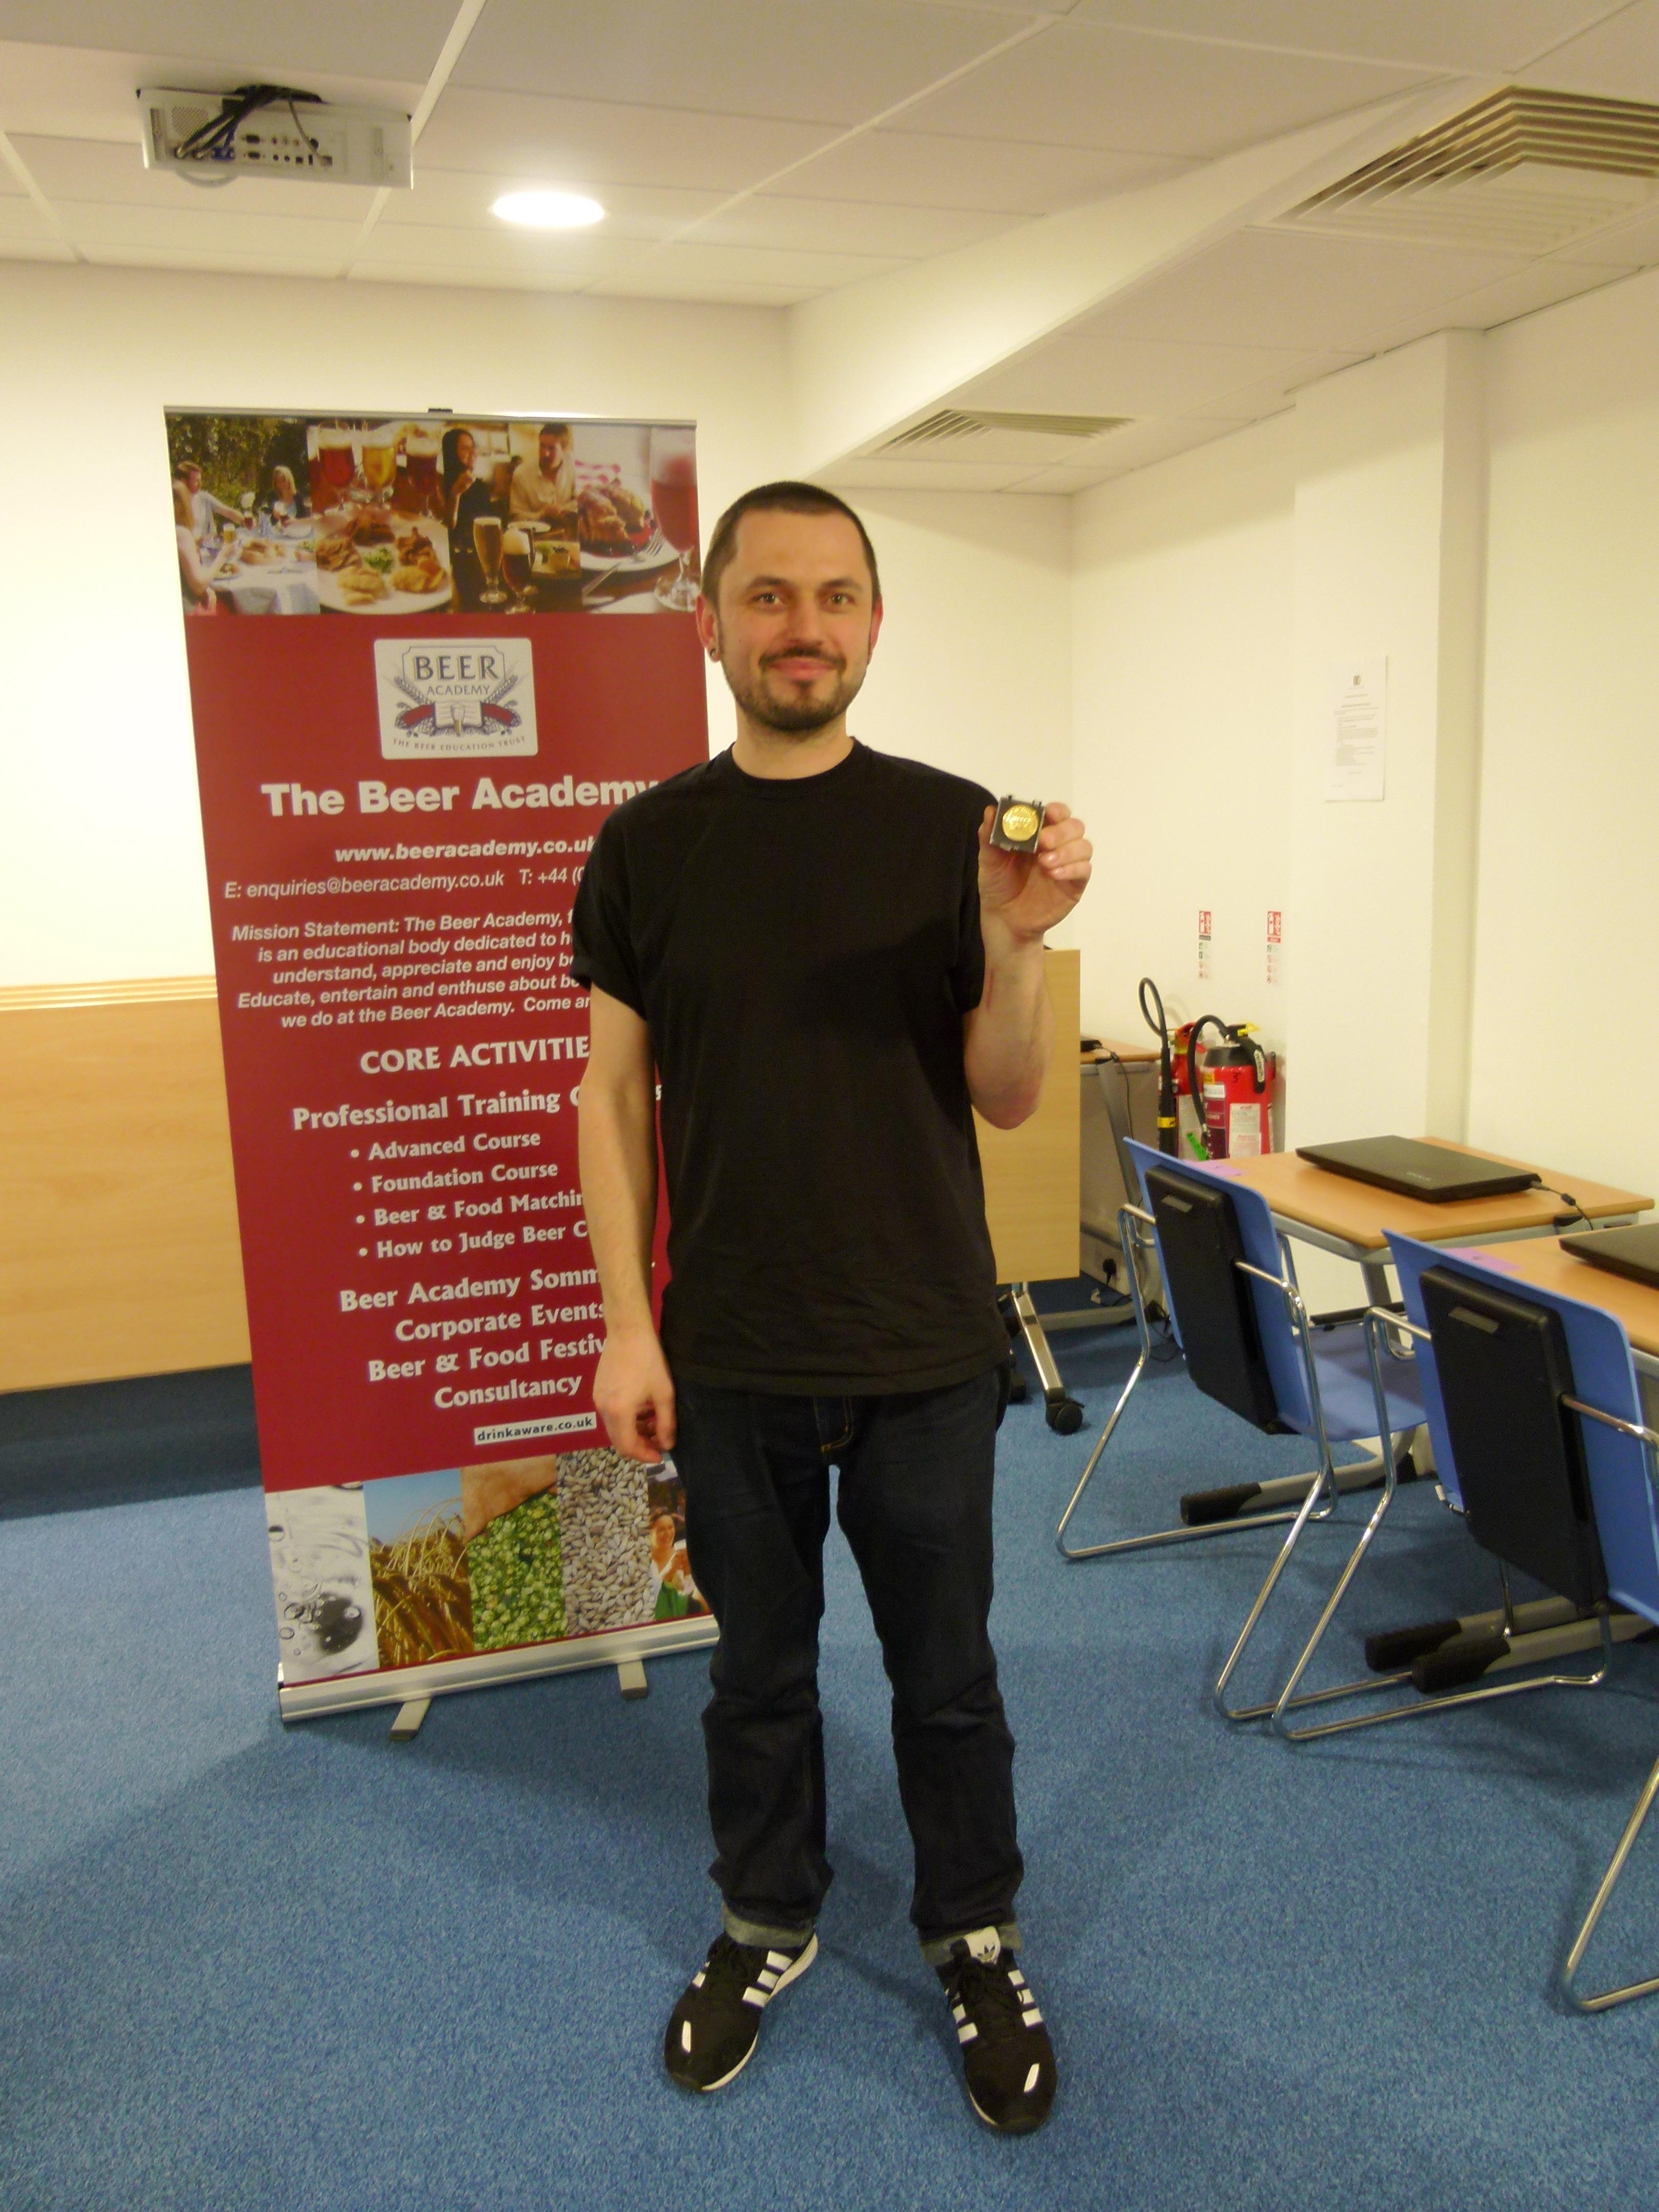 Matthew Hocking, Shrewsbury, England<br>Accredited: 19th November 2015